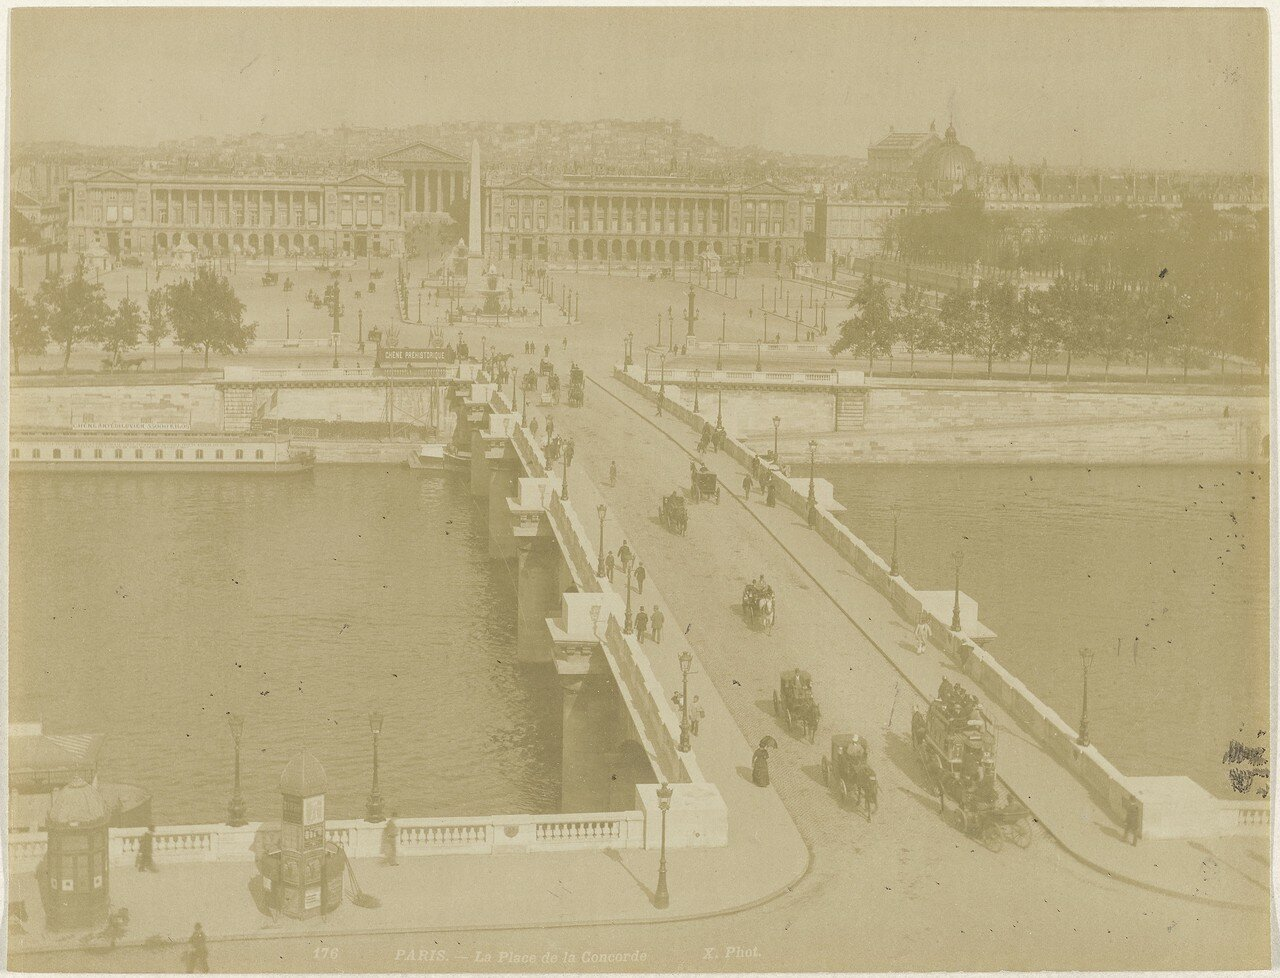 1870-е. Вид на Сену и площадь Согласия